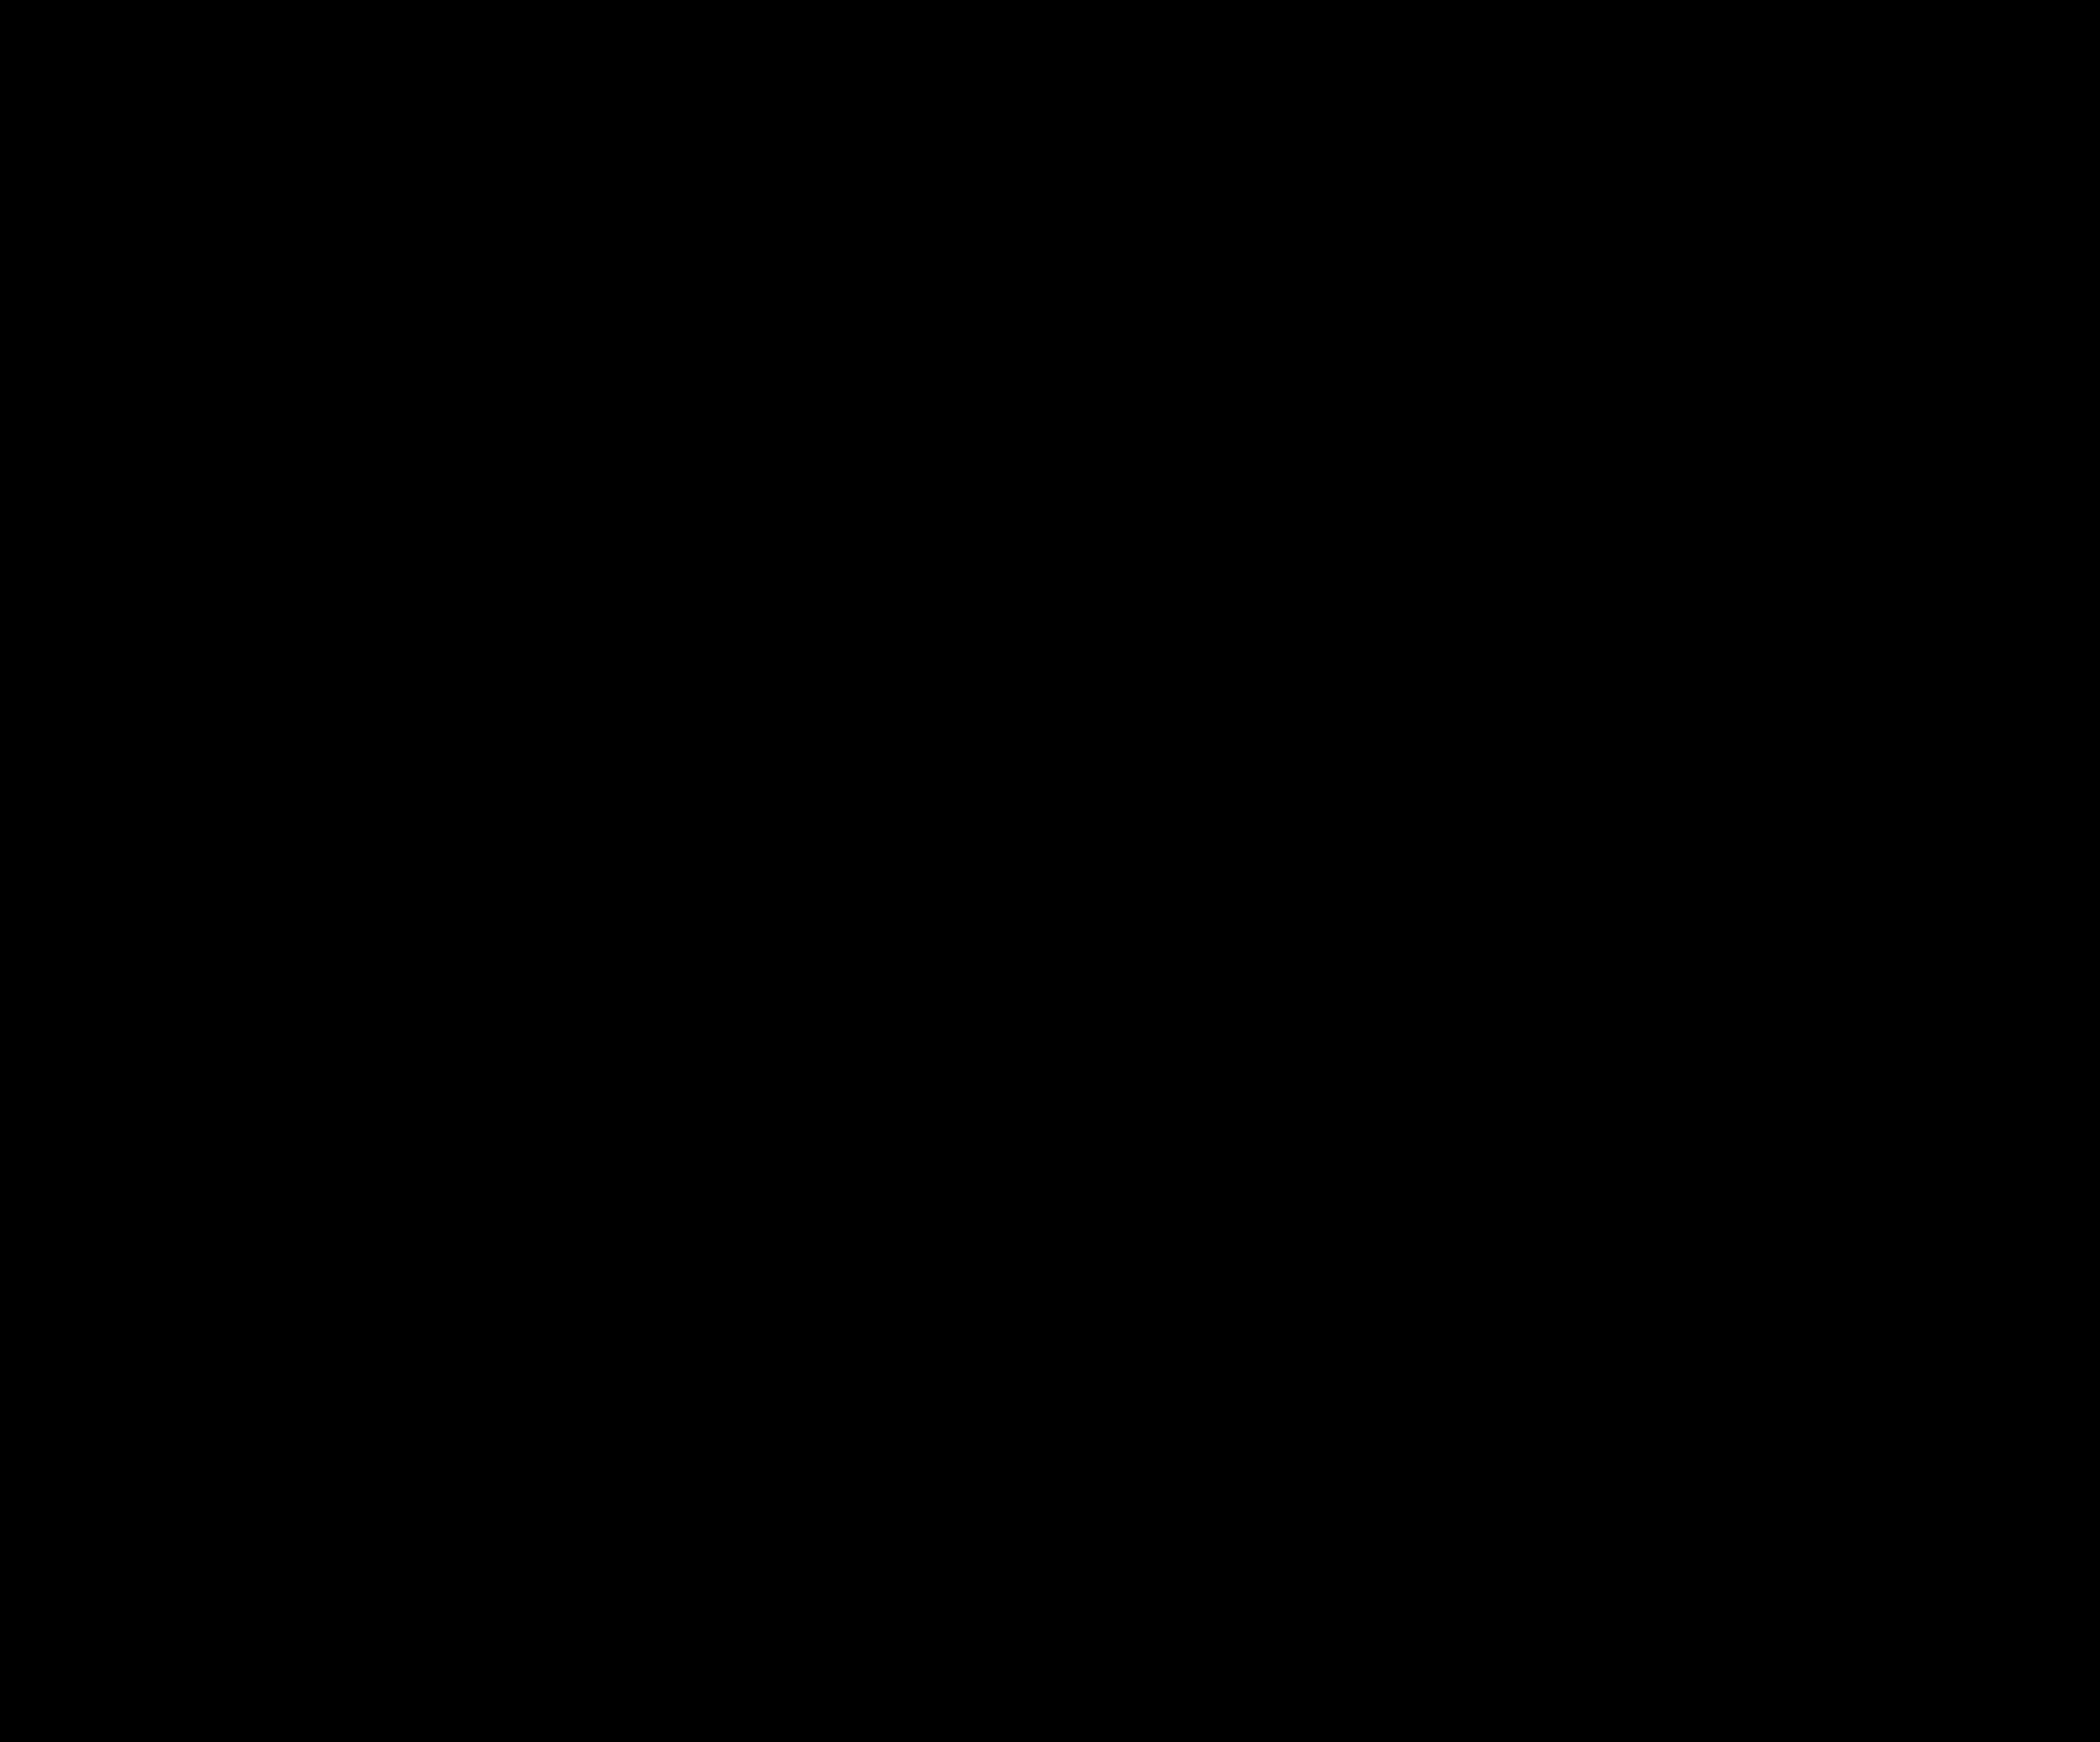 Honda vtx logo icons. Motorcycle clipart gold wing